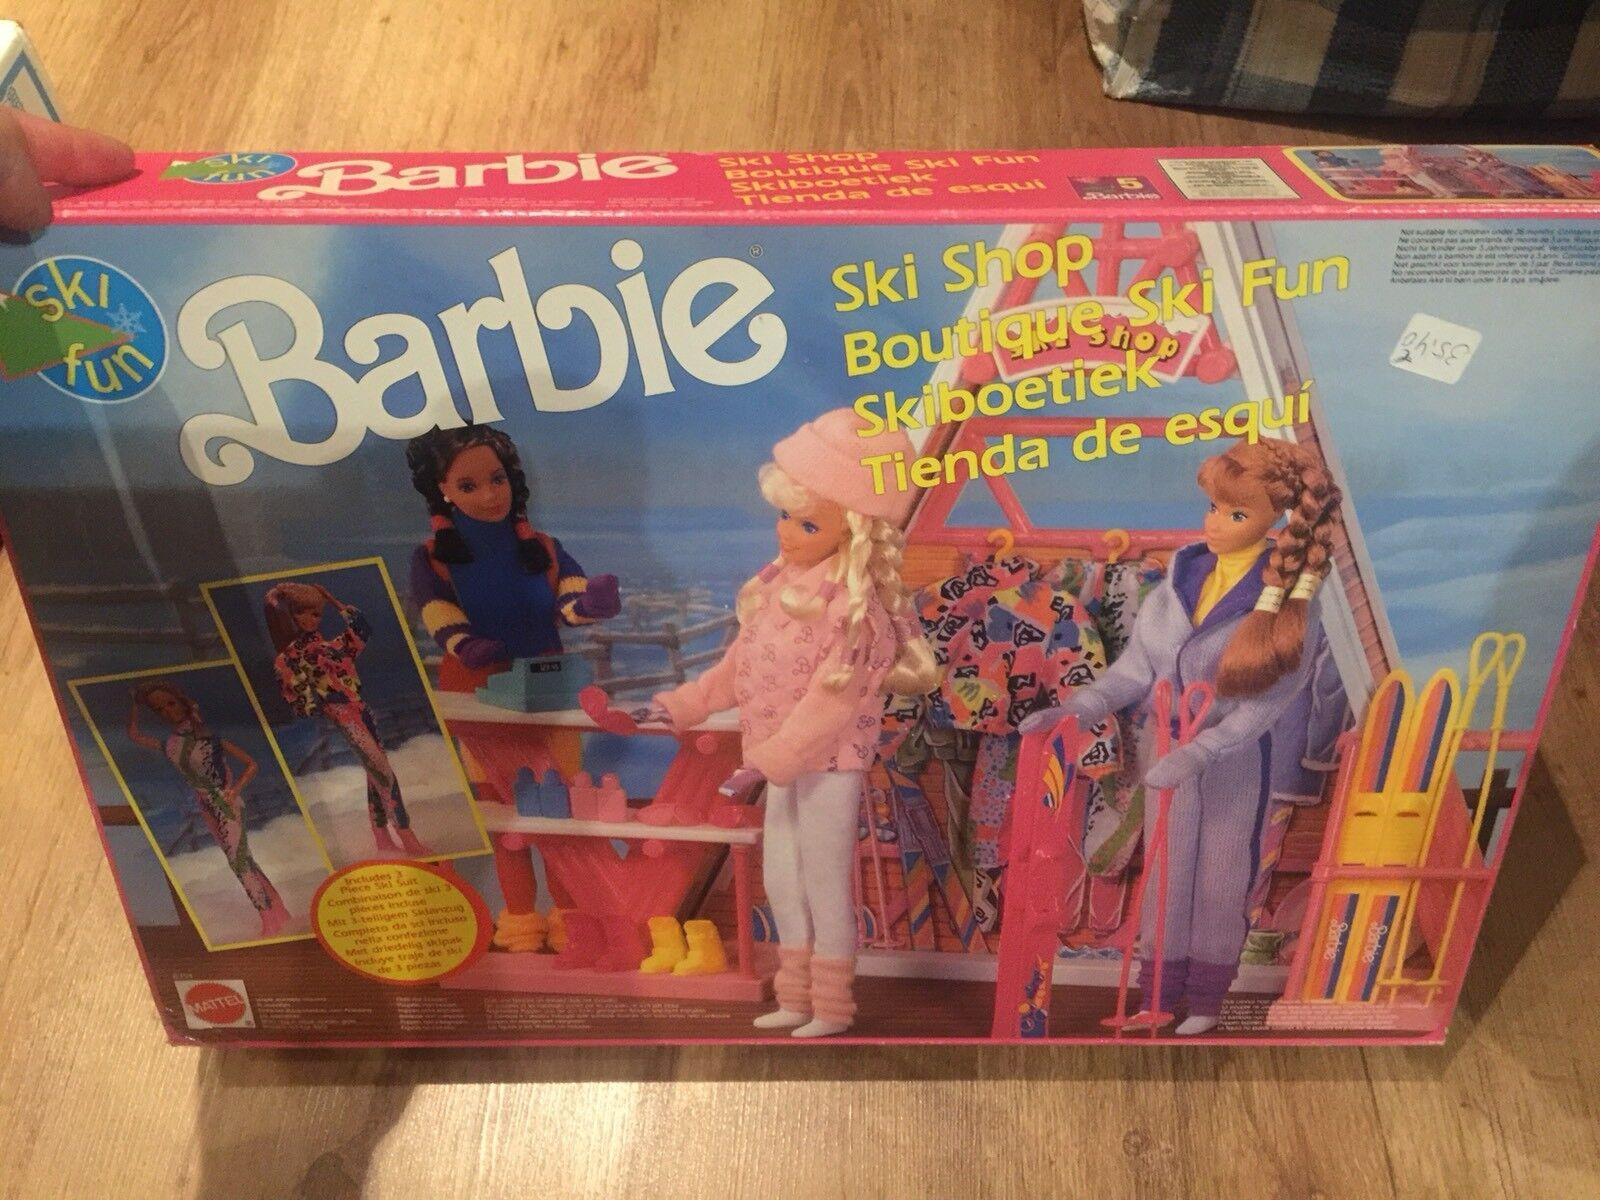 Barbie Sky Shop - opened 1990